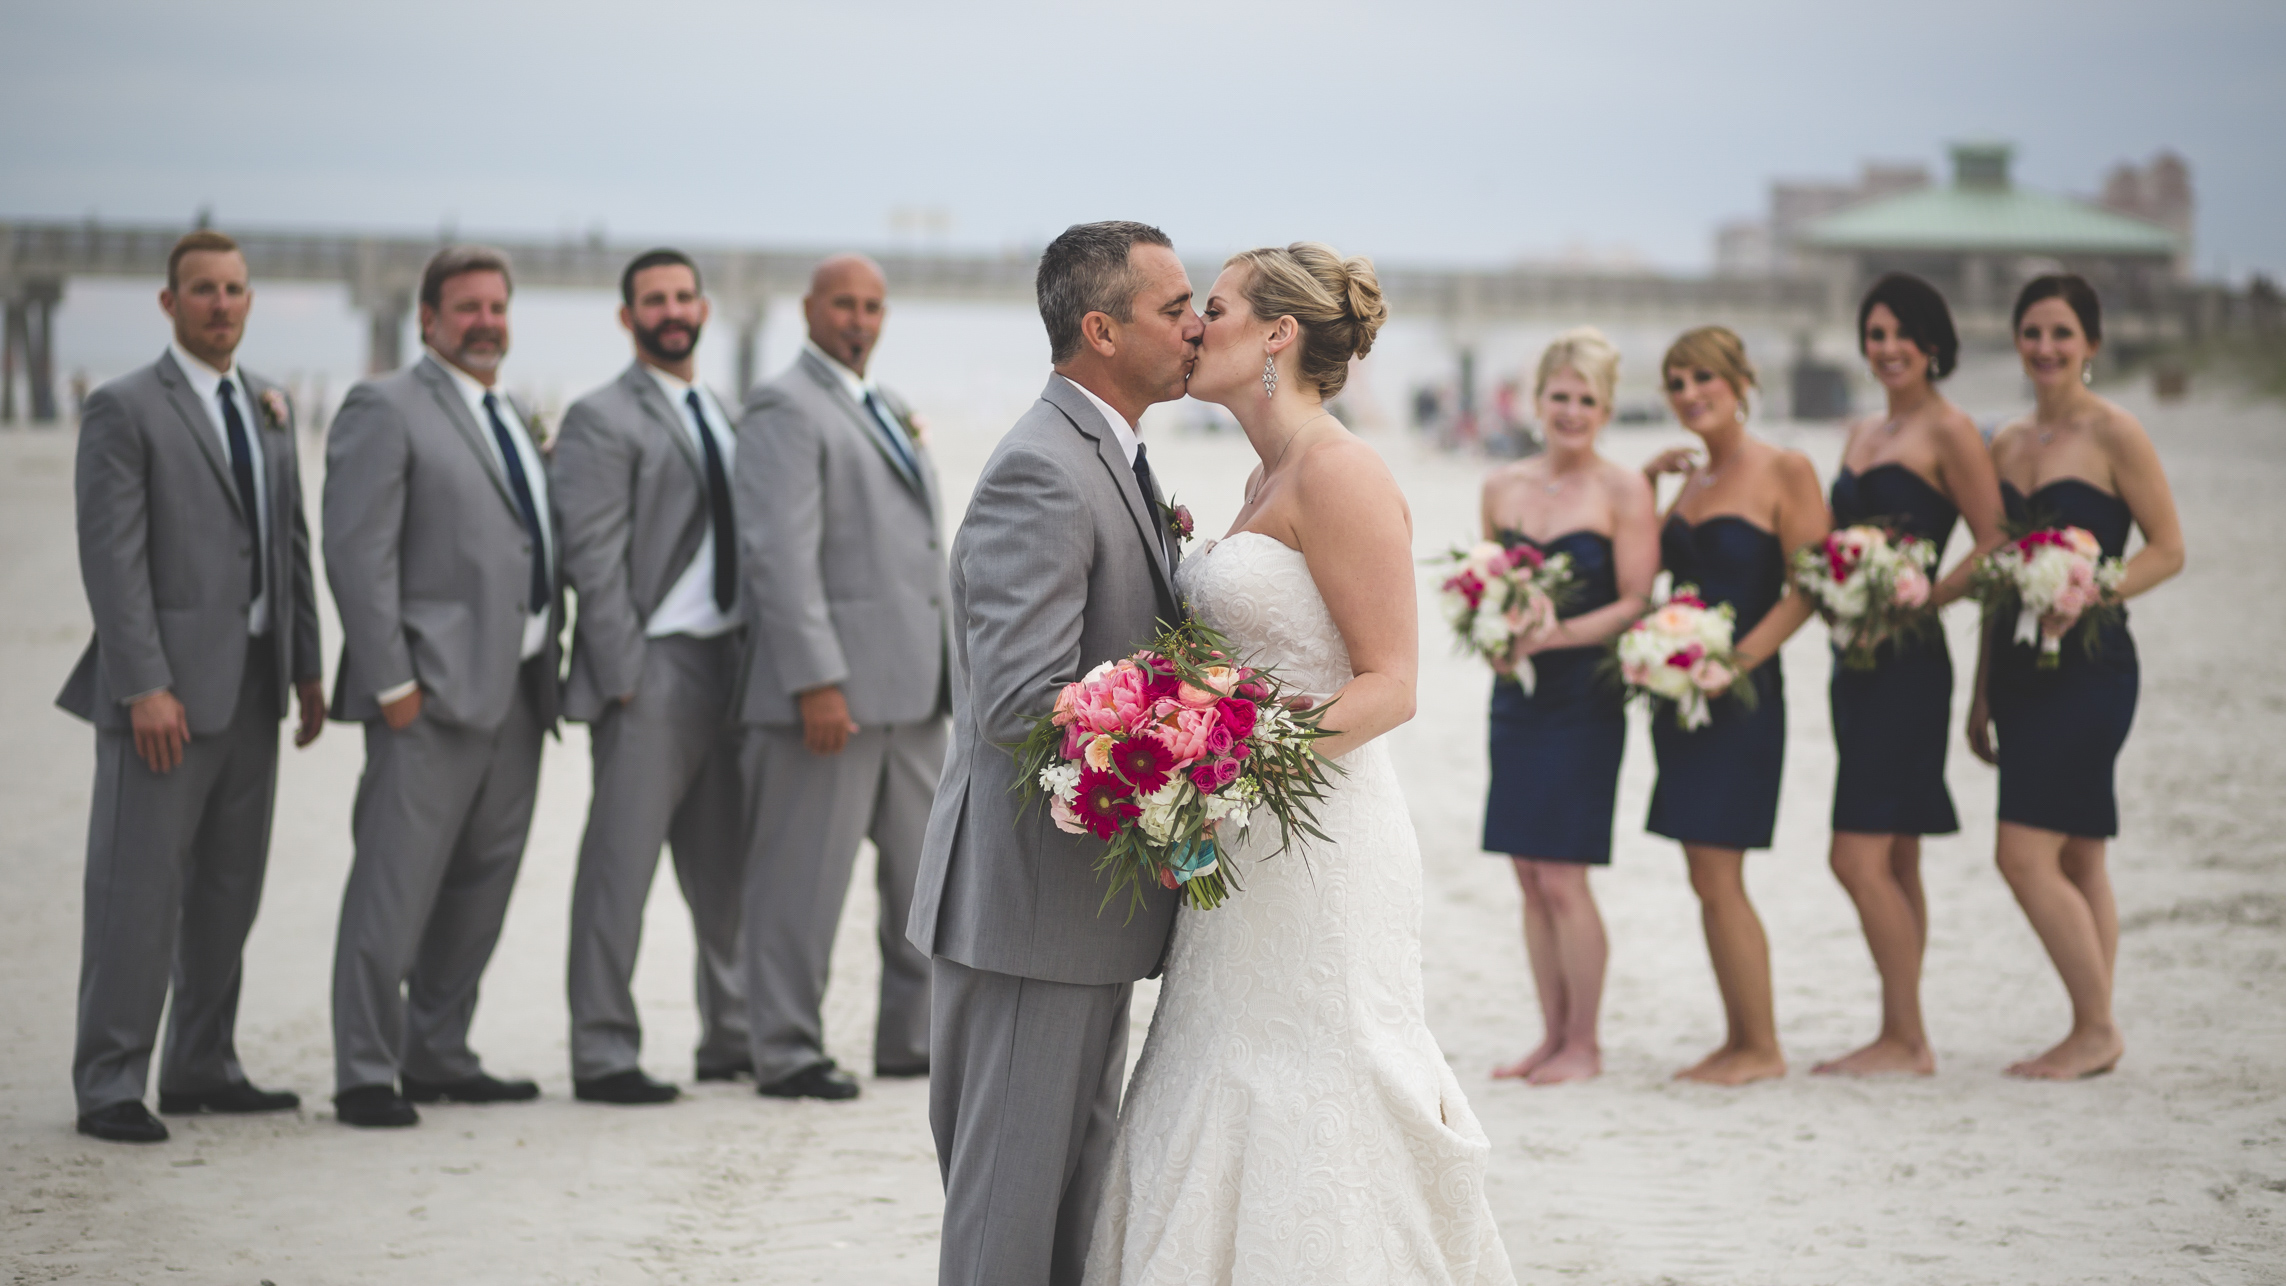 adam-szarmack-casa-marina-wedding-photographer-jacksonville-beach-florida-39.jpg